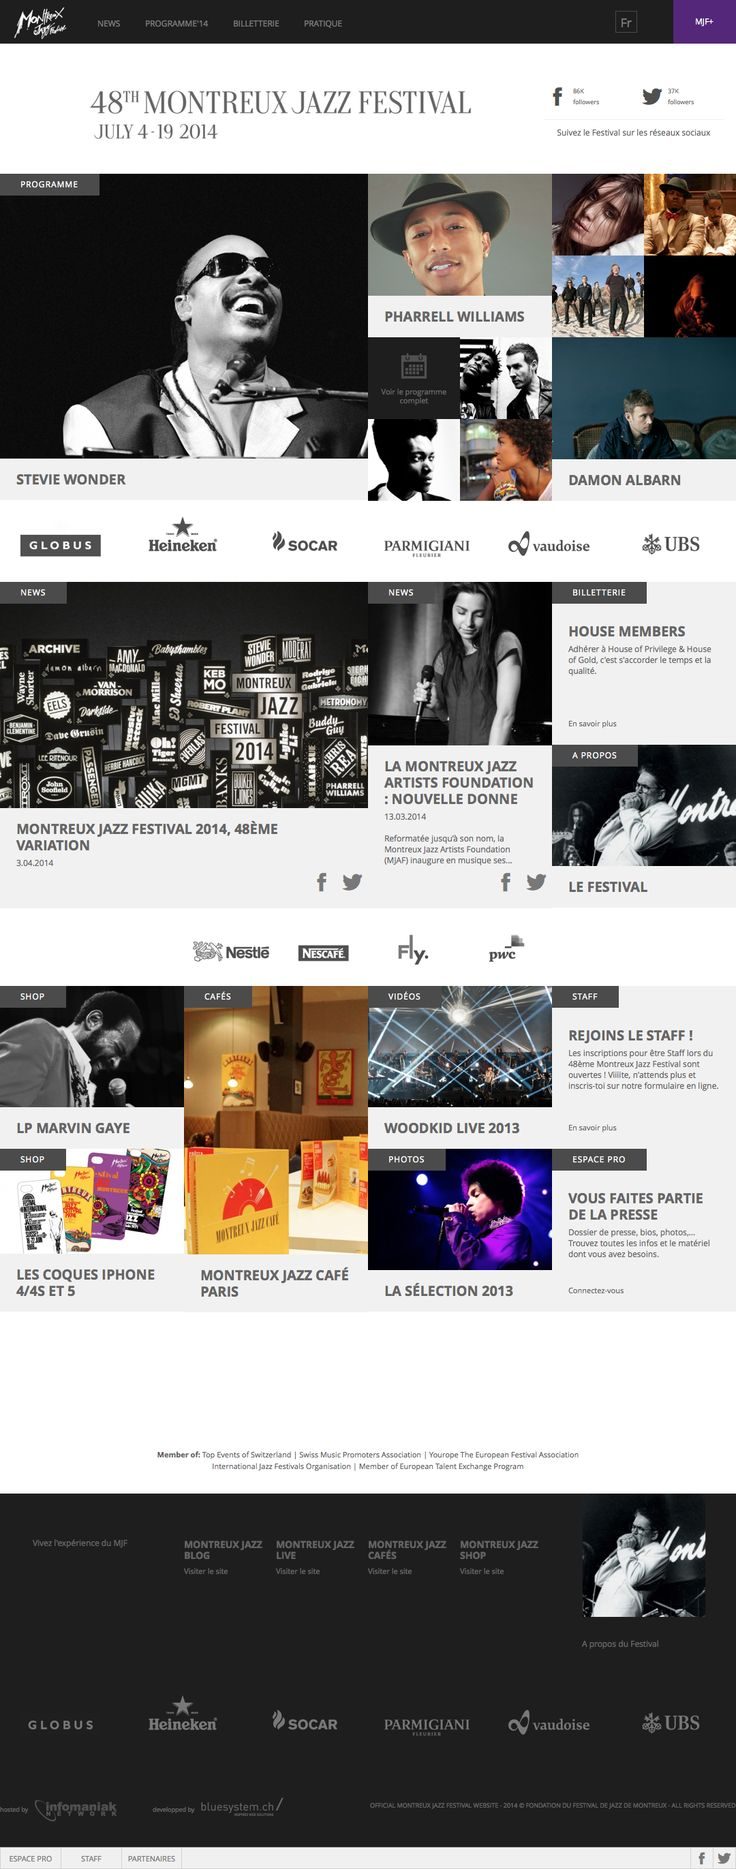 Montreux Jazz Festival #webdesign #inspiration - Follow my webdesign board on Pinterest: http://lvn.io/cscwebdesign